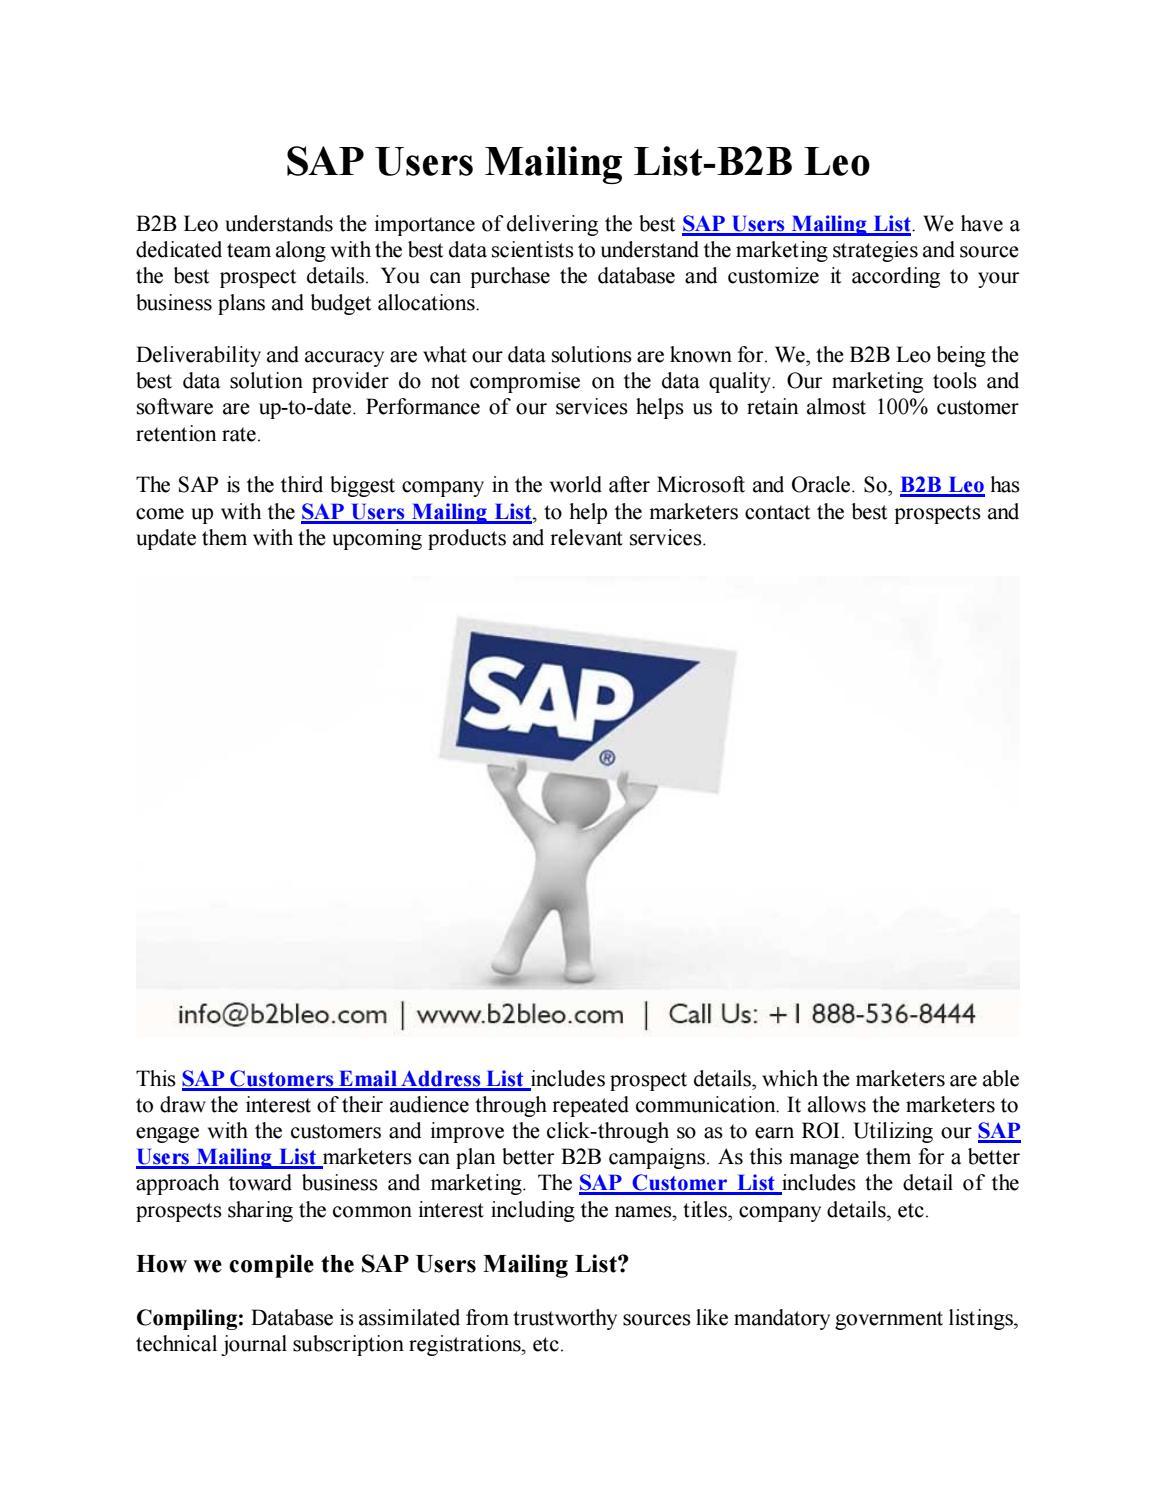 SAP Users Mailing List-B2B Leo by B2B Business List - issuu